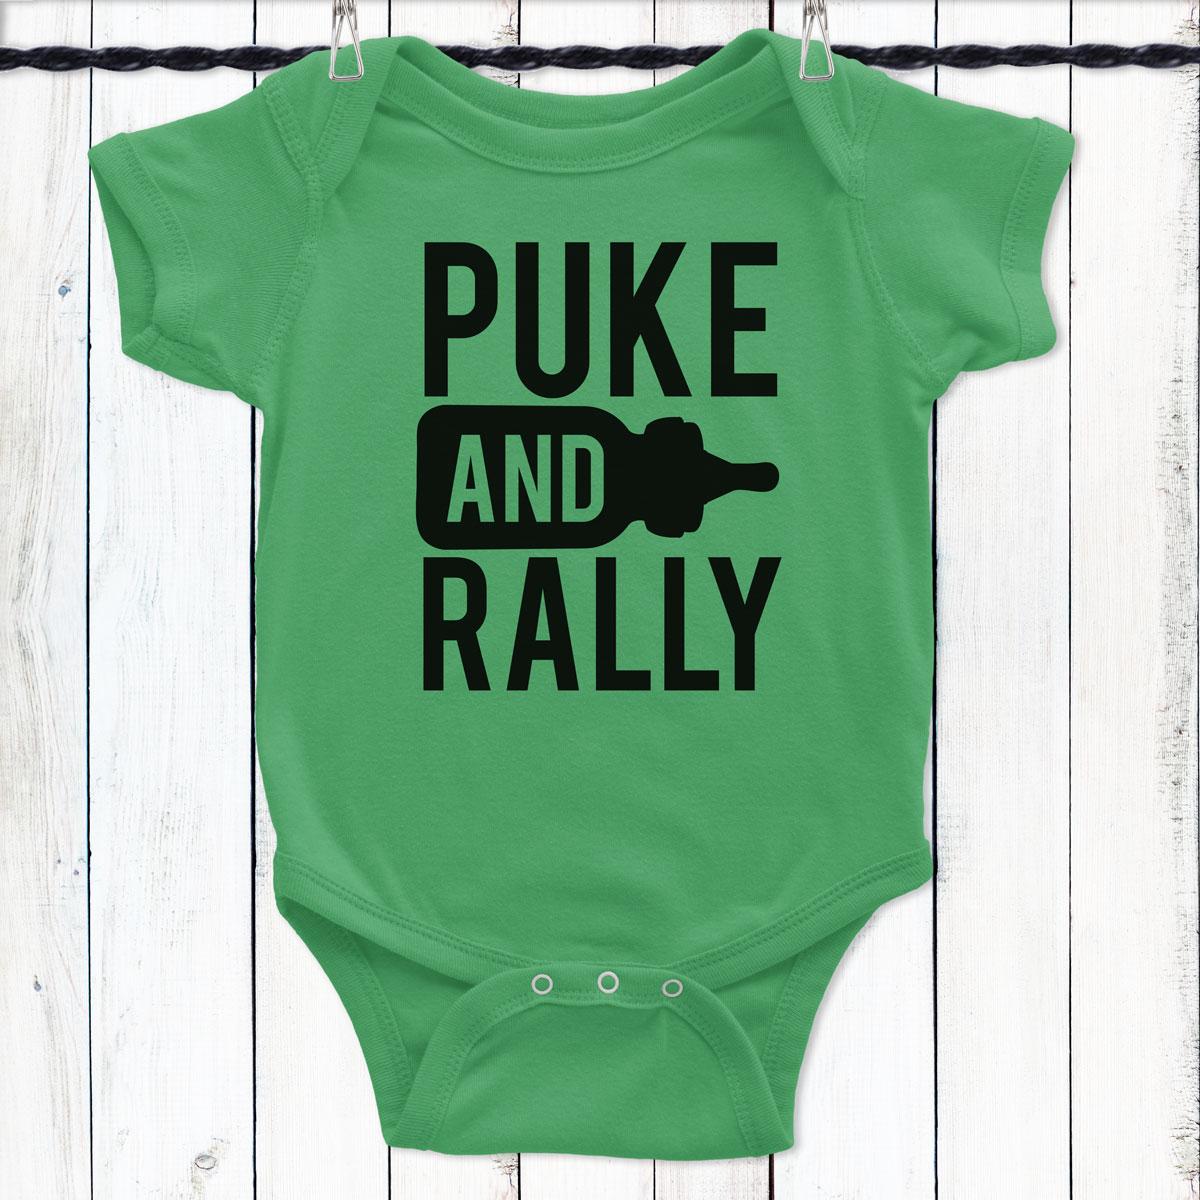 puke-and-rally.jpg